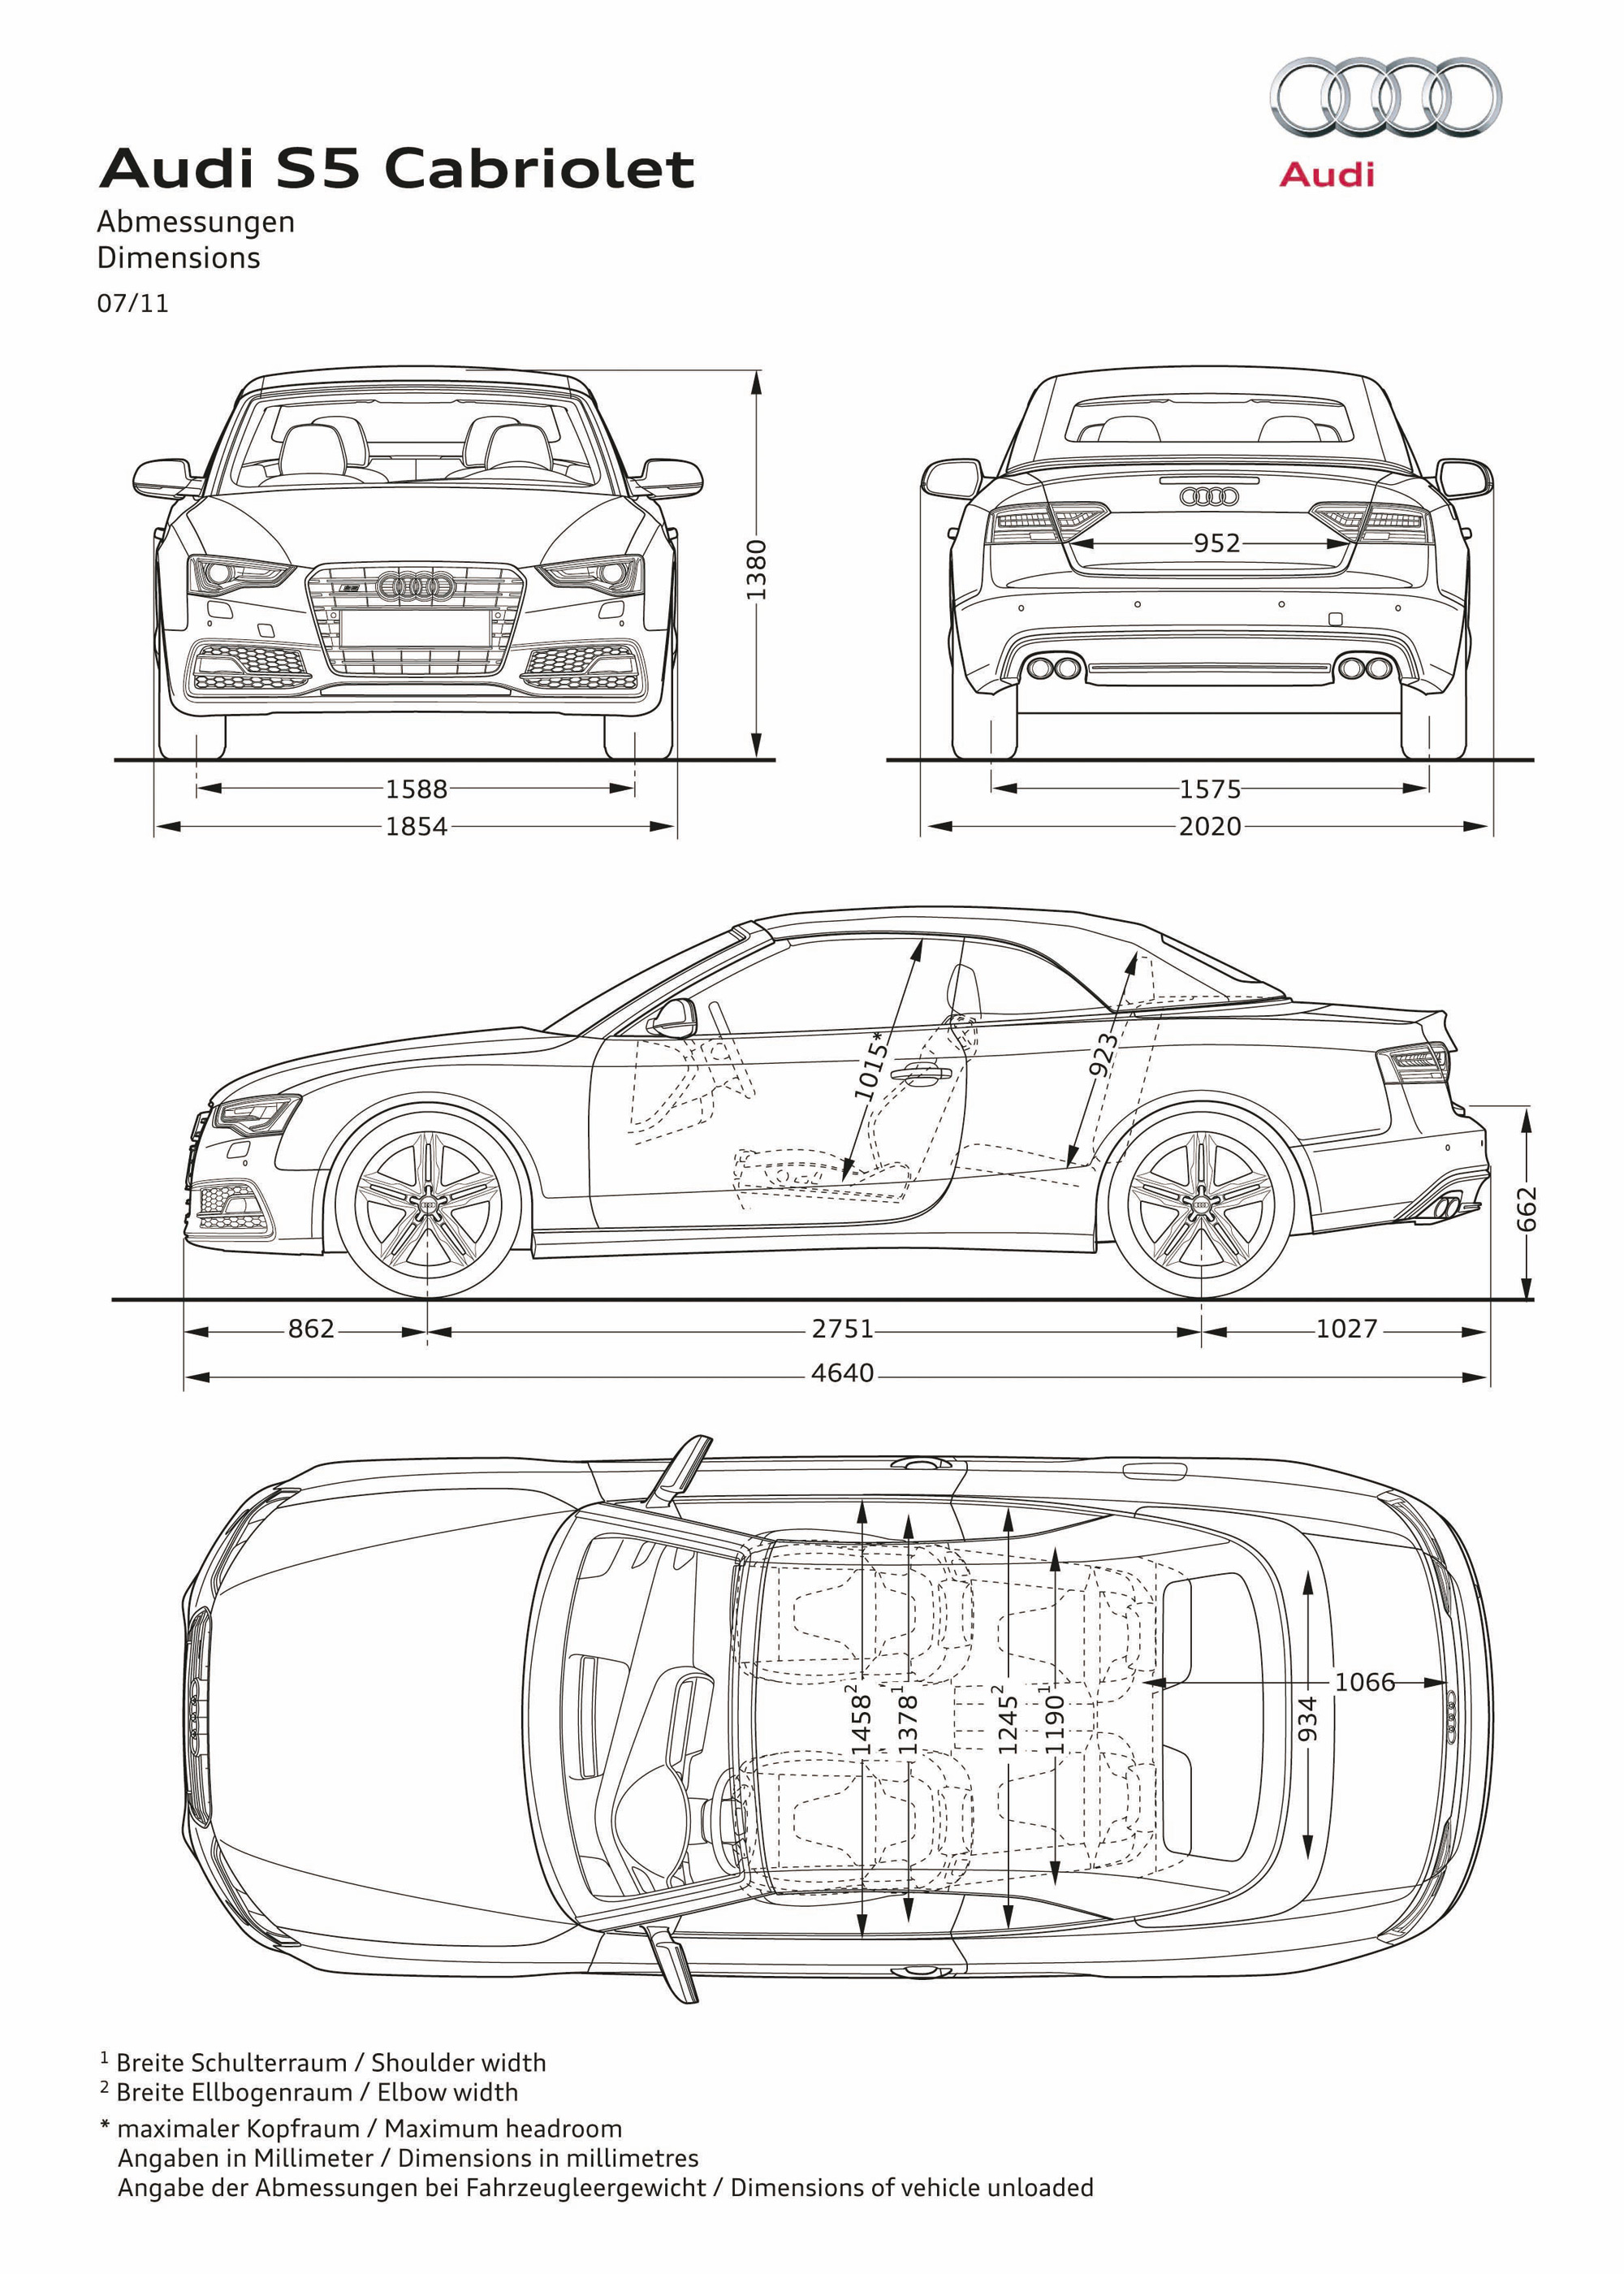 Ausmotive Audi S5 Photo Gallery